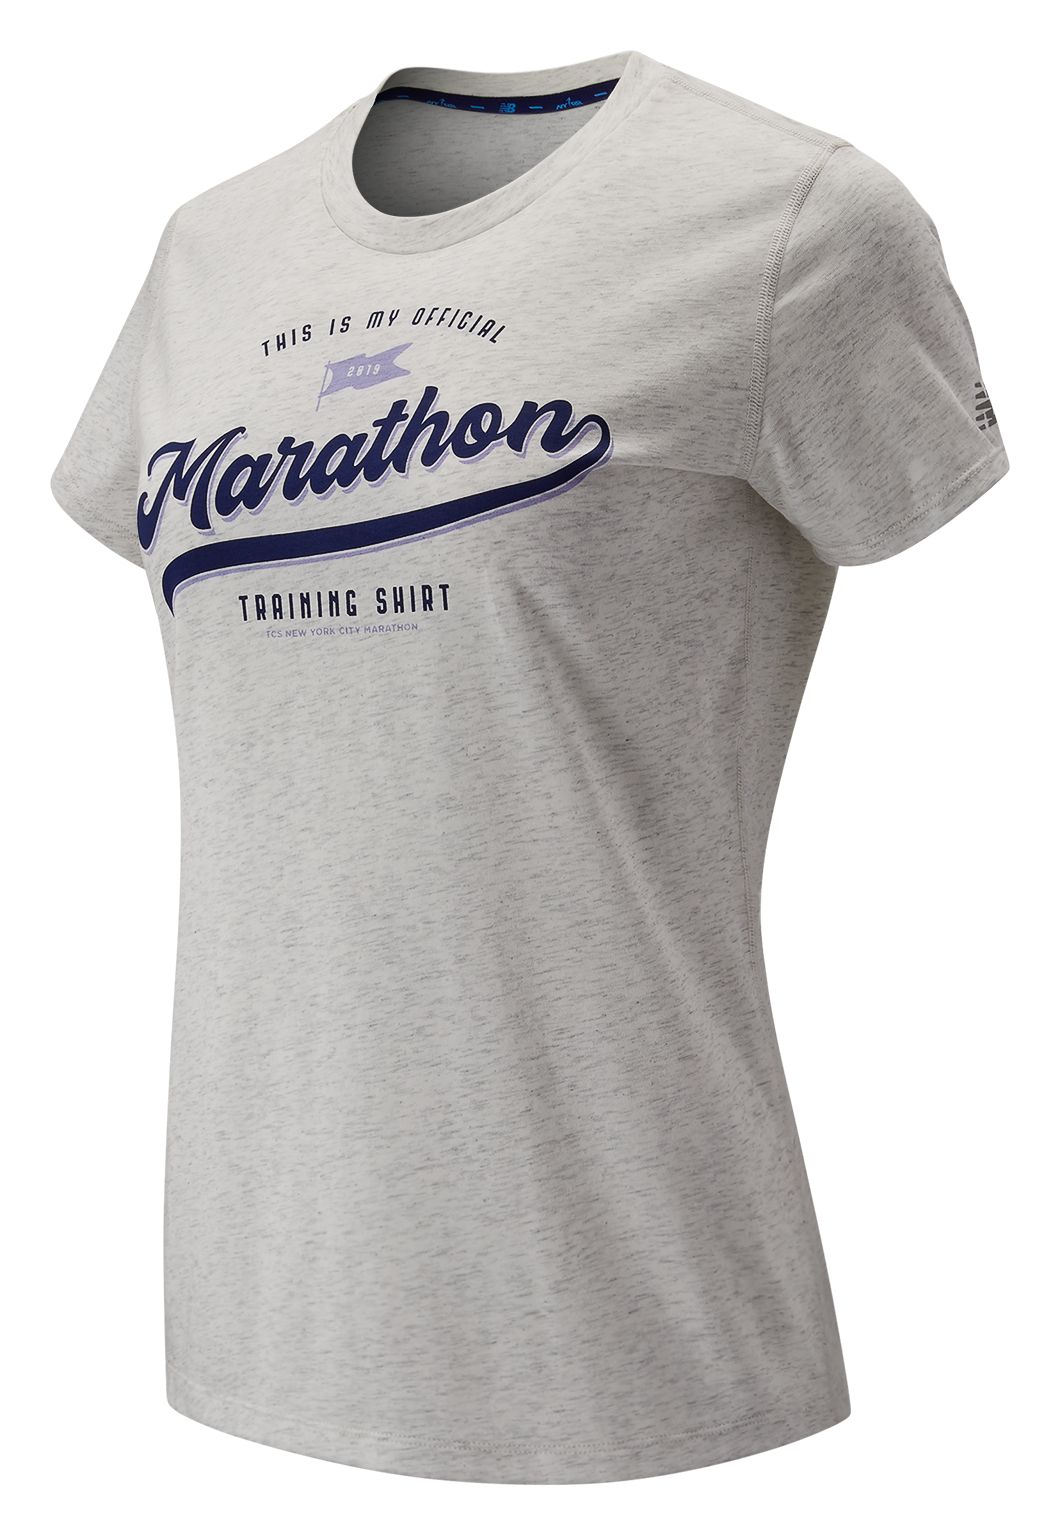 Women's 2019 NYC Marathon Heathertech Training Graphic Tee